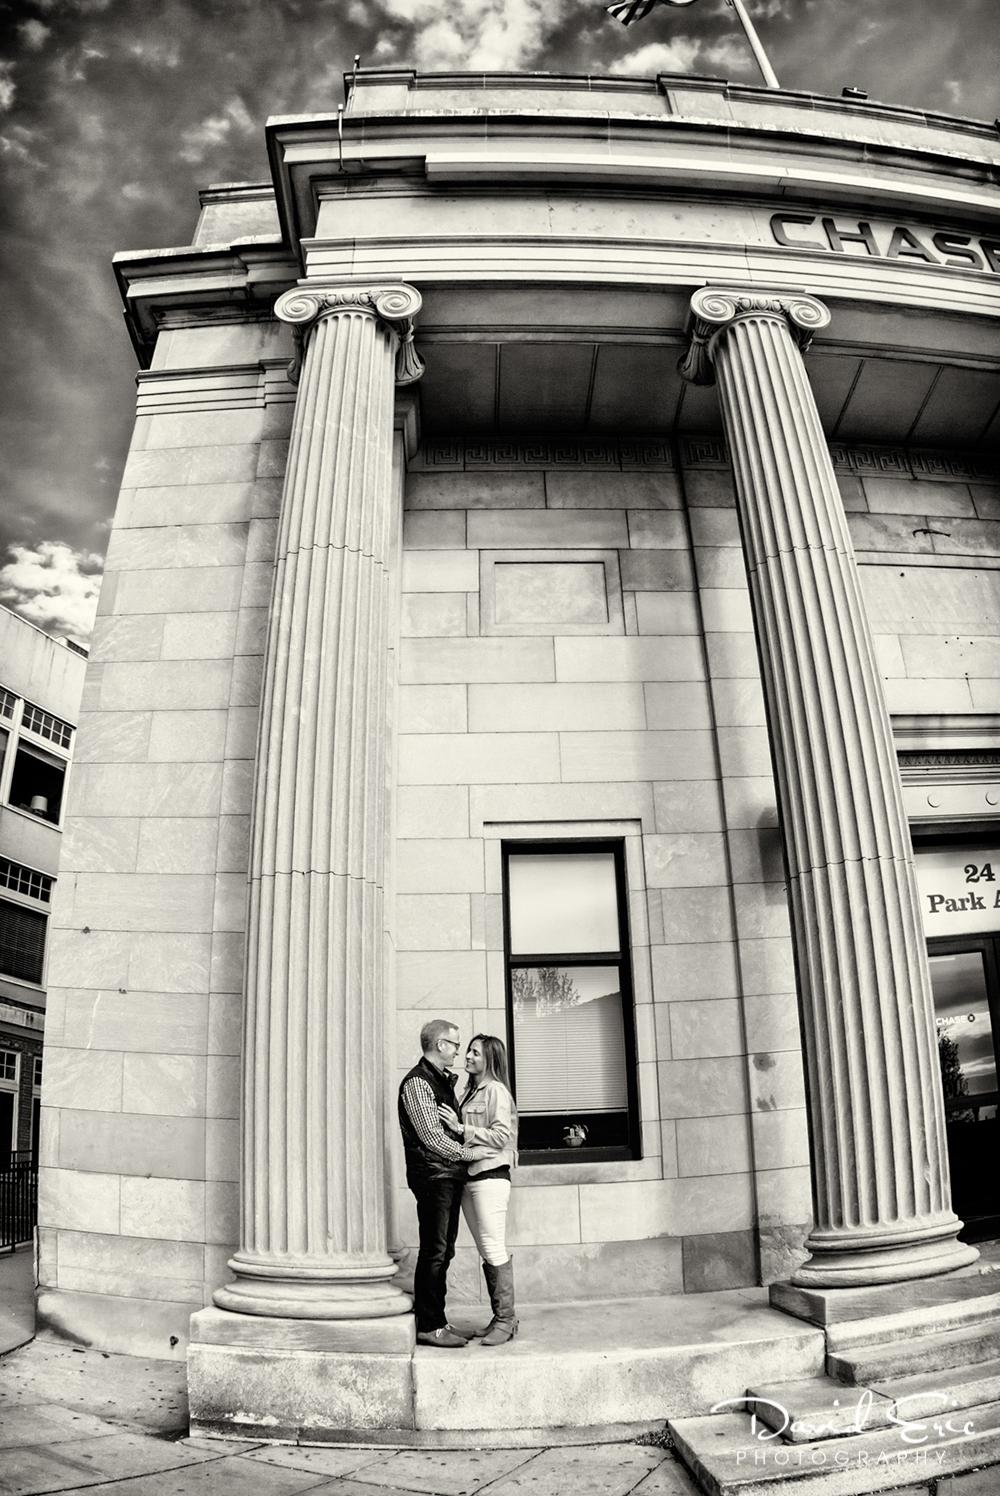 Urban Street Photography - David Eric Photography